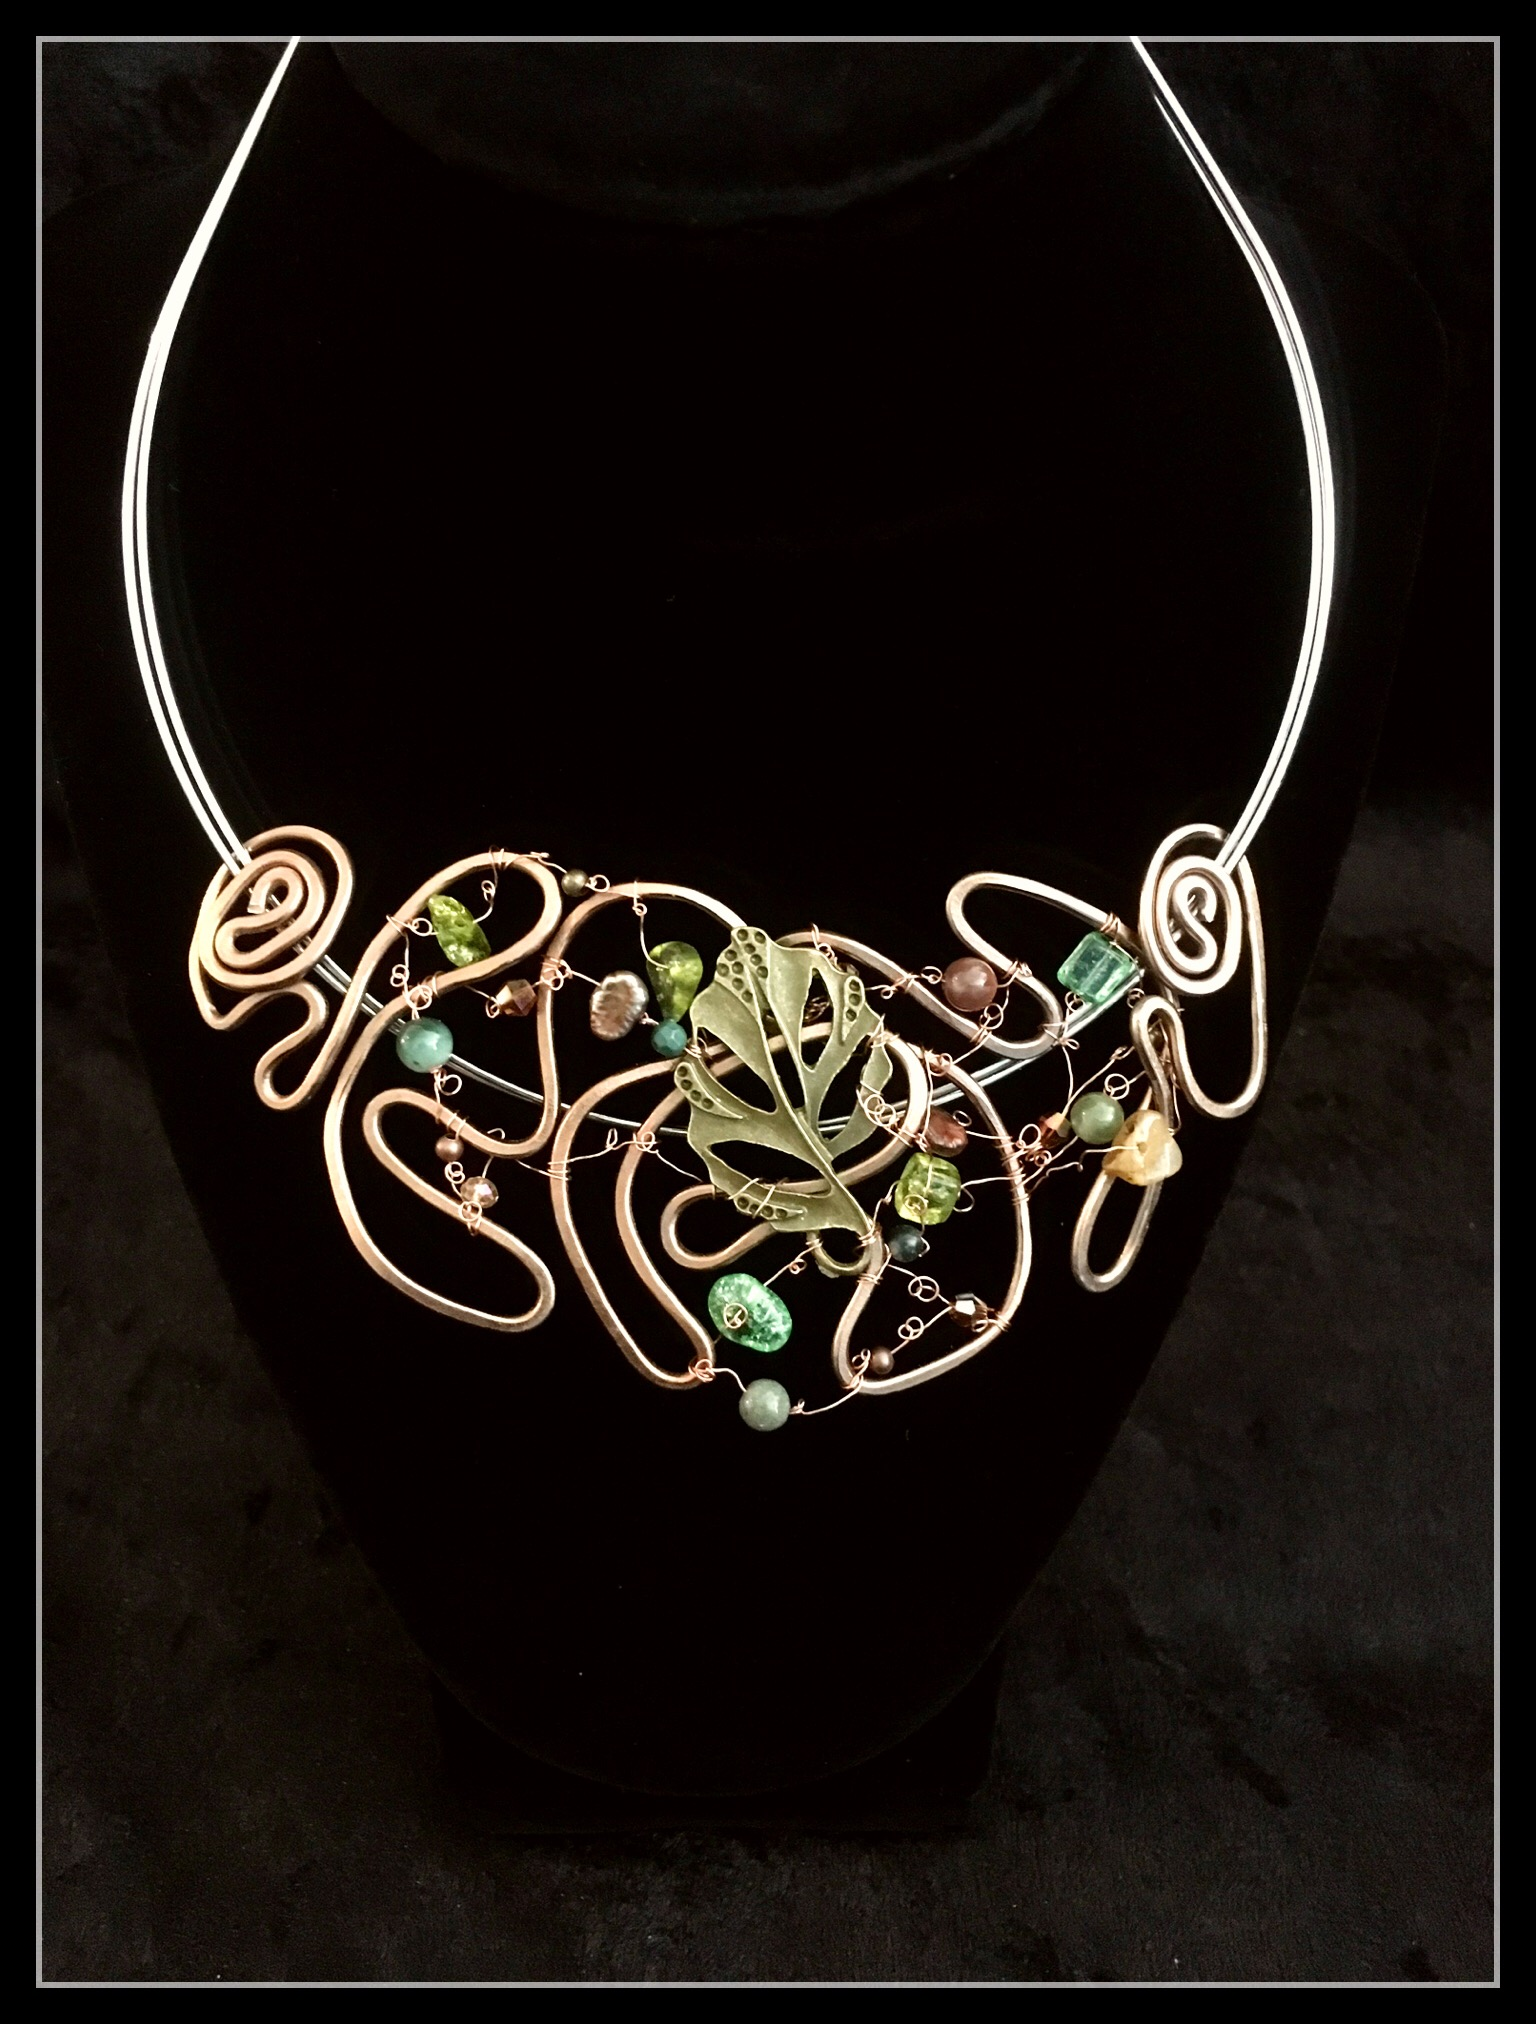 2016 FFS Big Leaf necklace